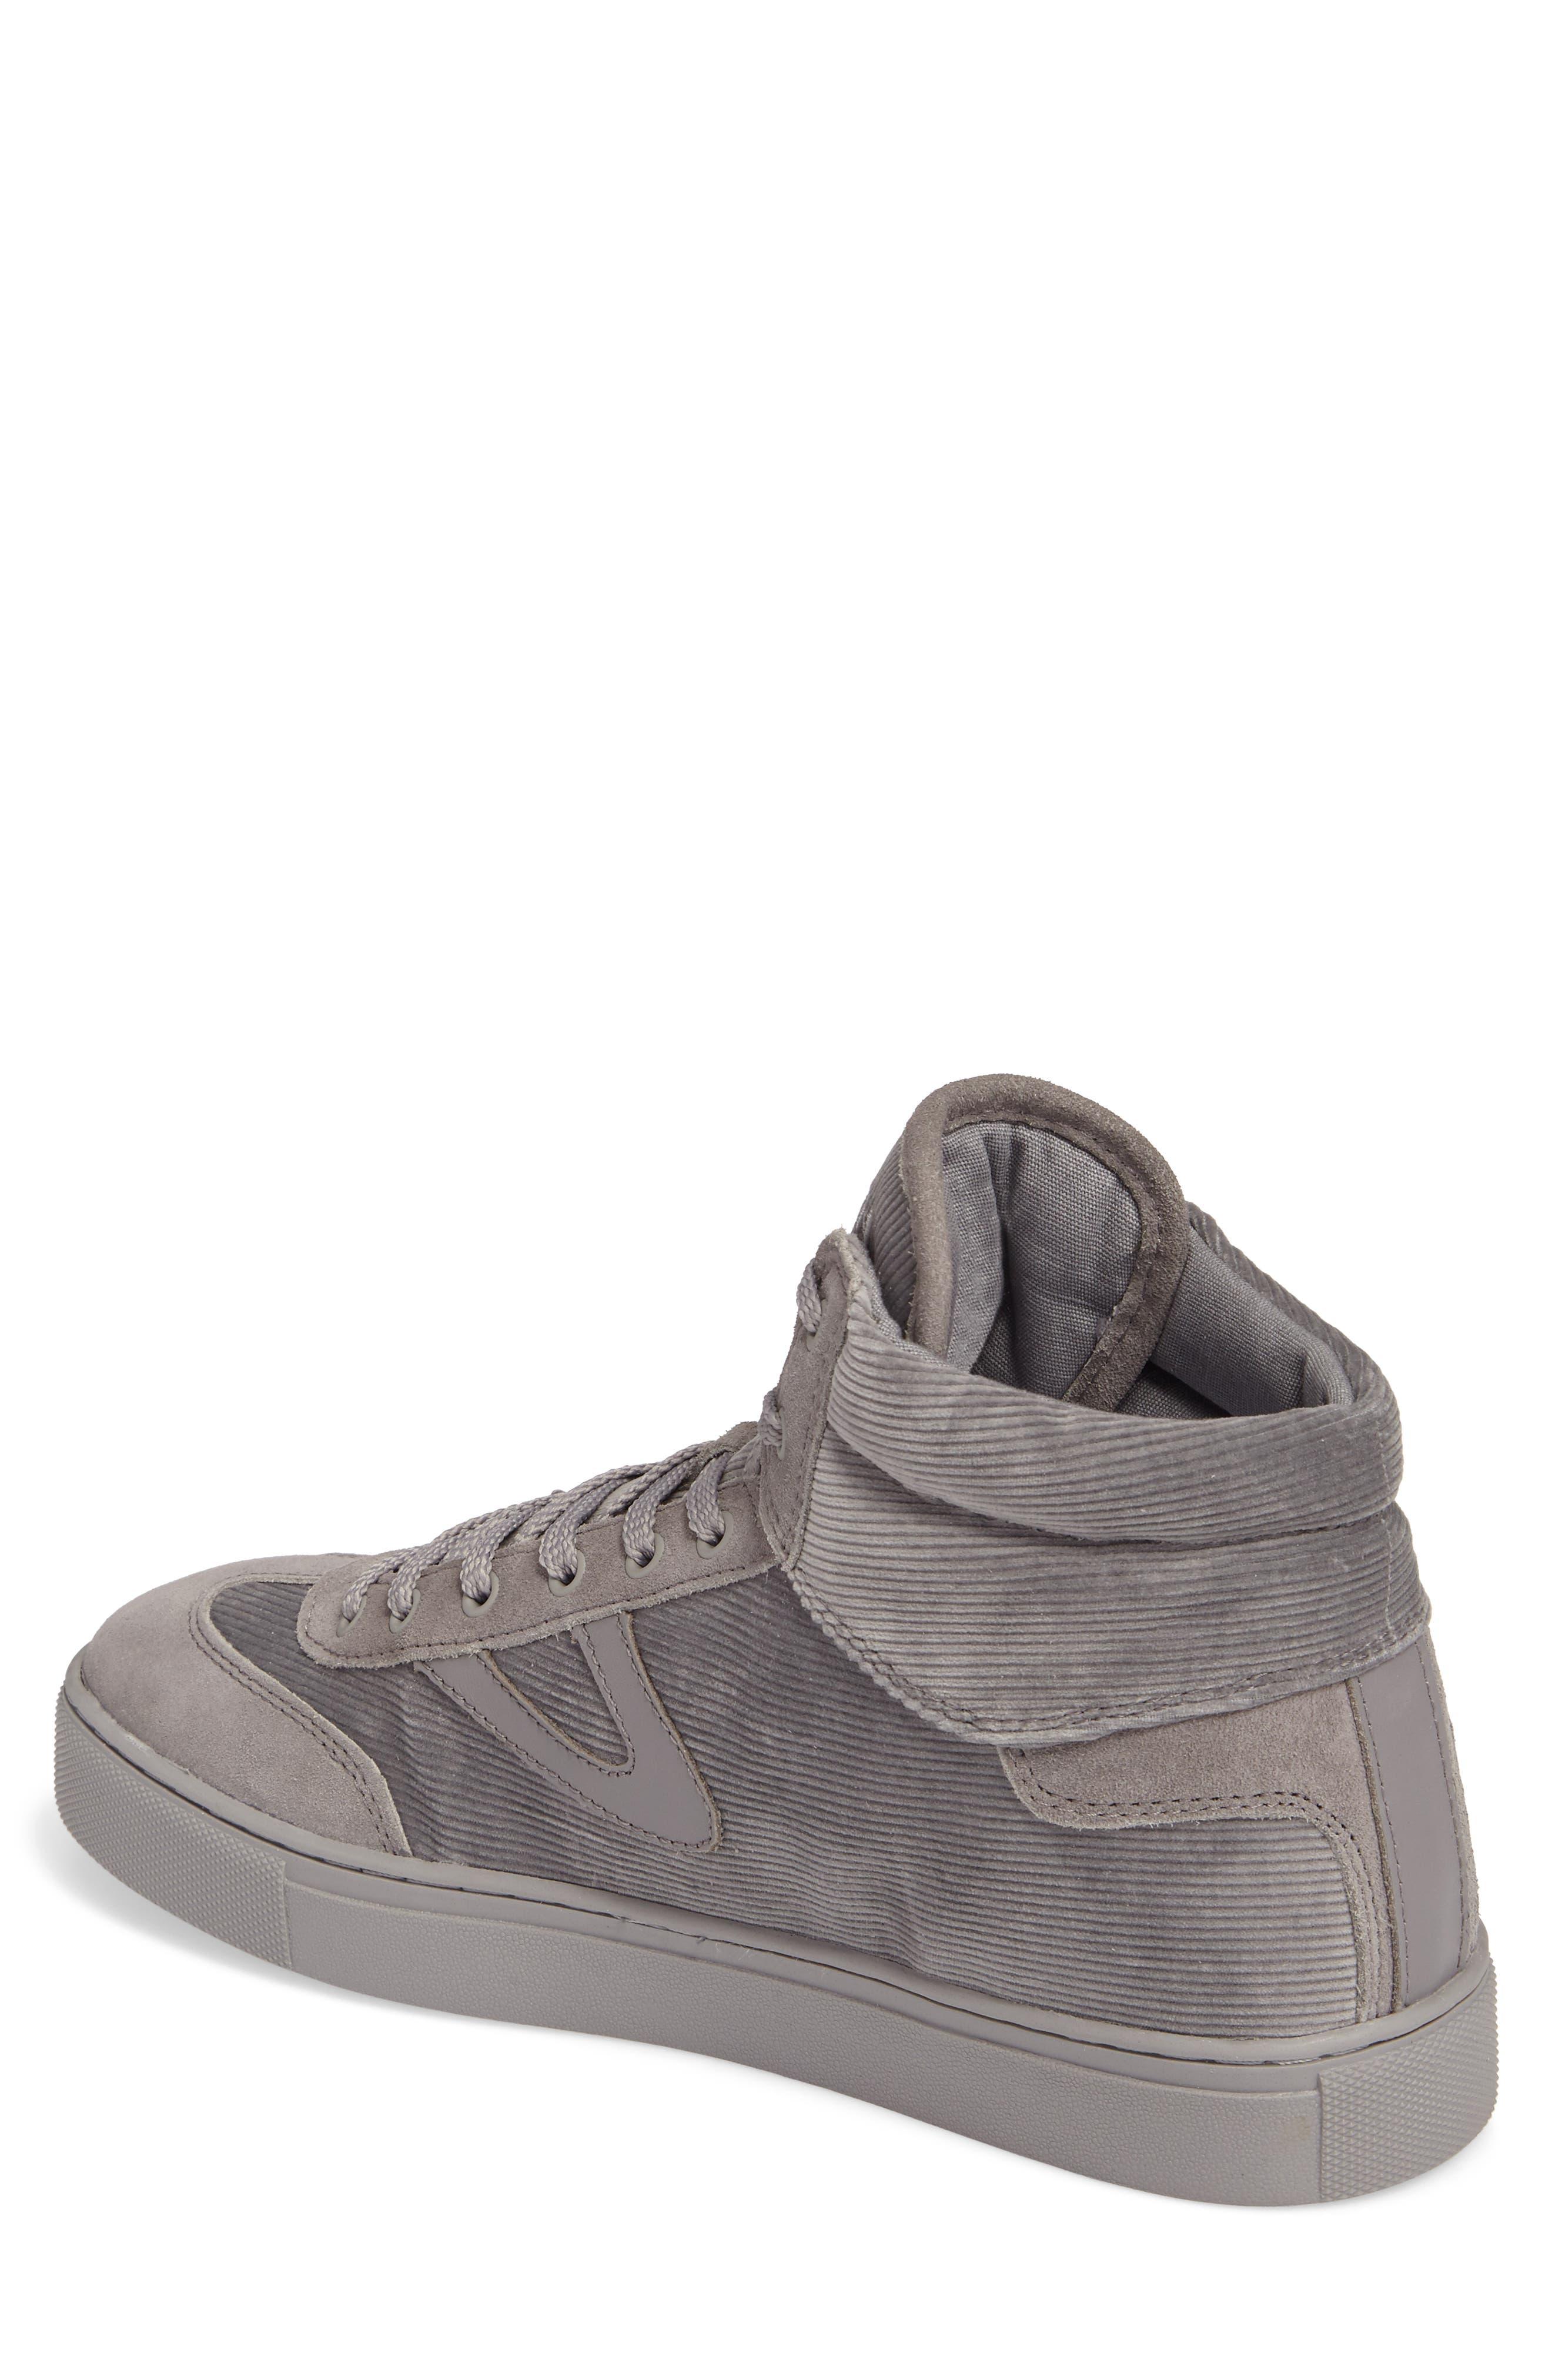 Jack High Top Sneaker,                             Alternate thumbnail 3, color,